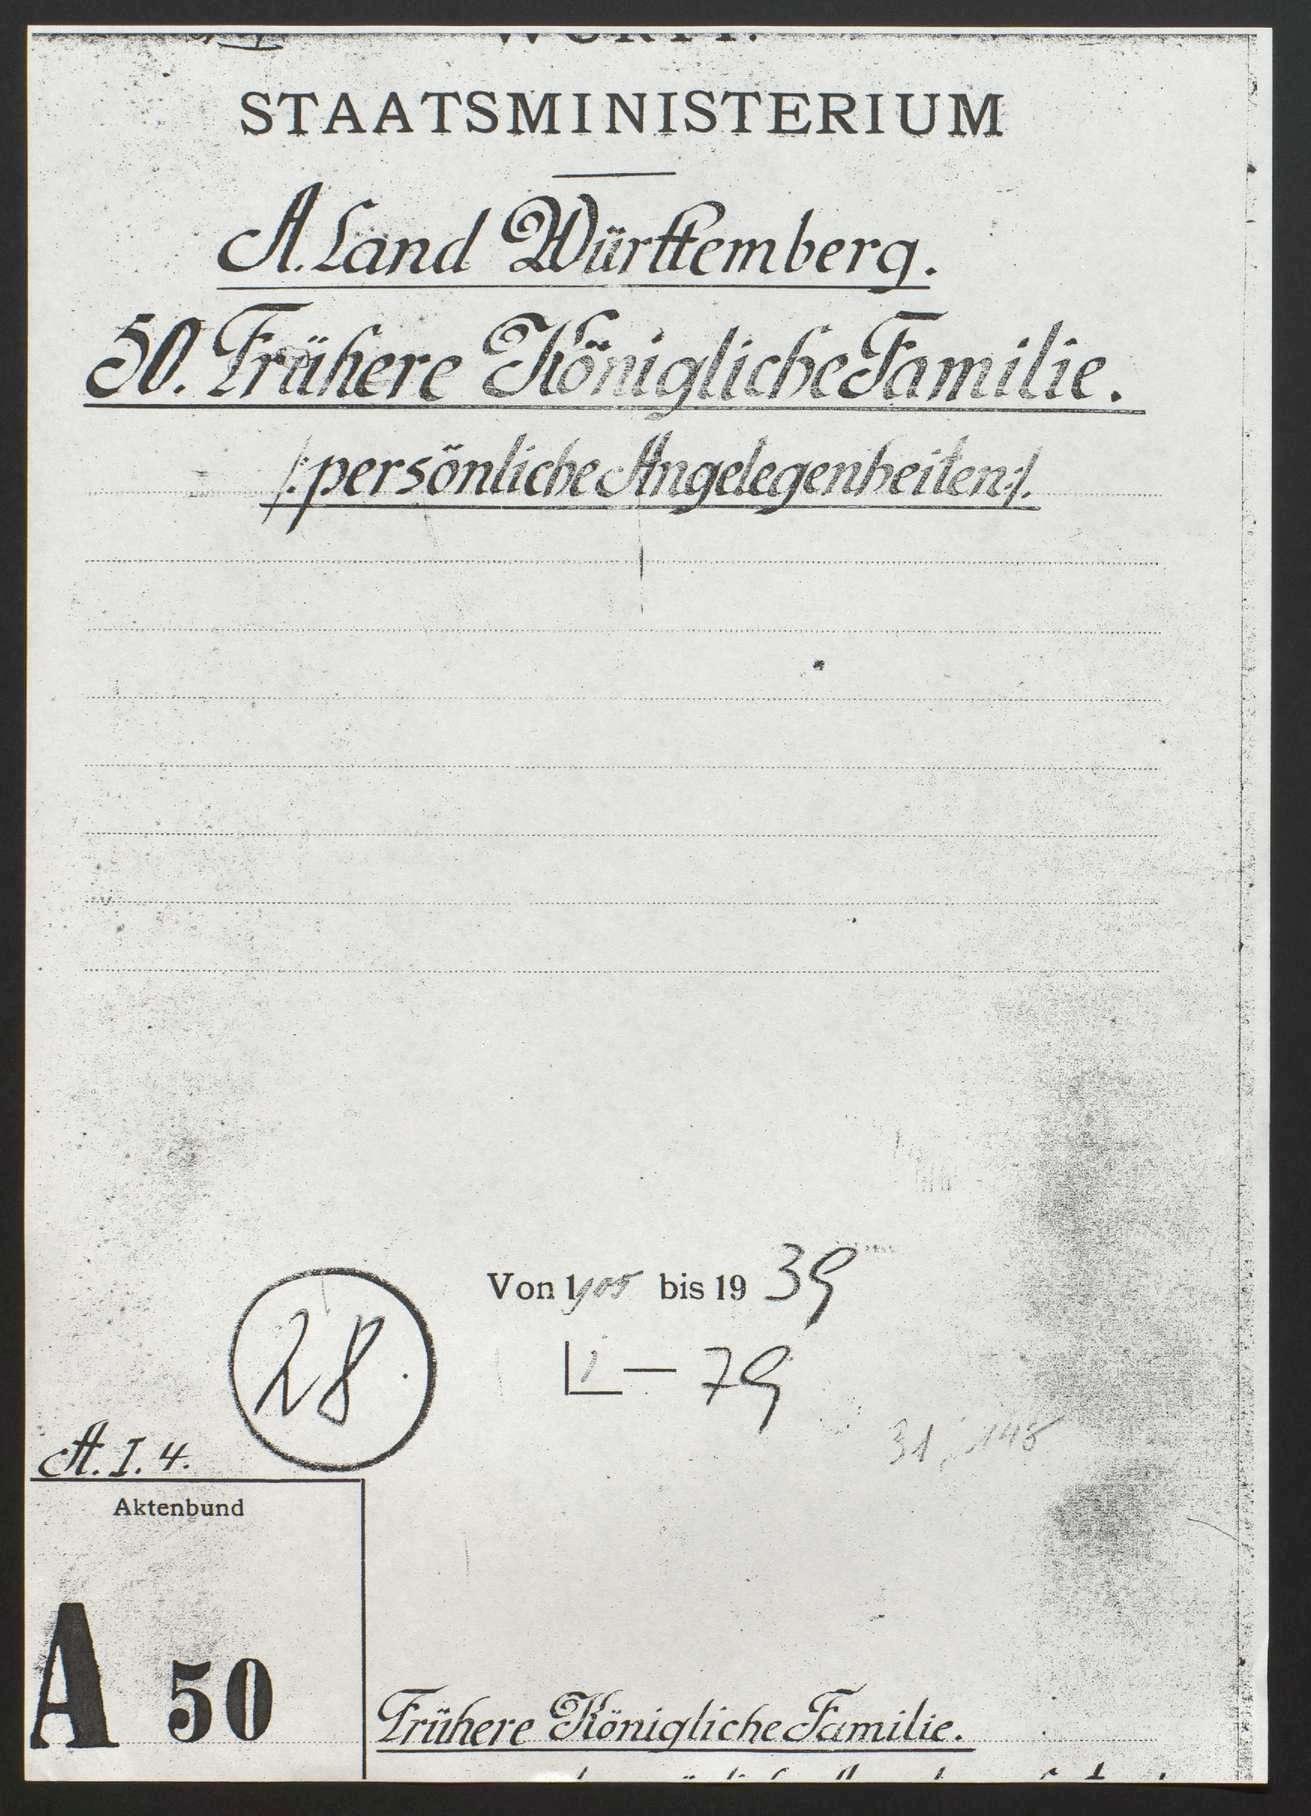 König-Karl-Jubiläum-Stiftung anläßlich des 25jährigen Regierungsjubiläums König Karls, Bild 1